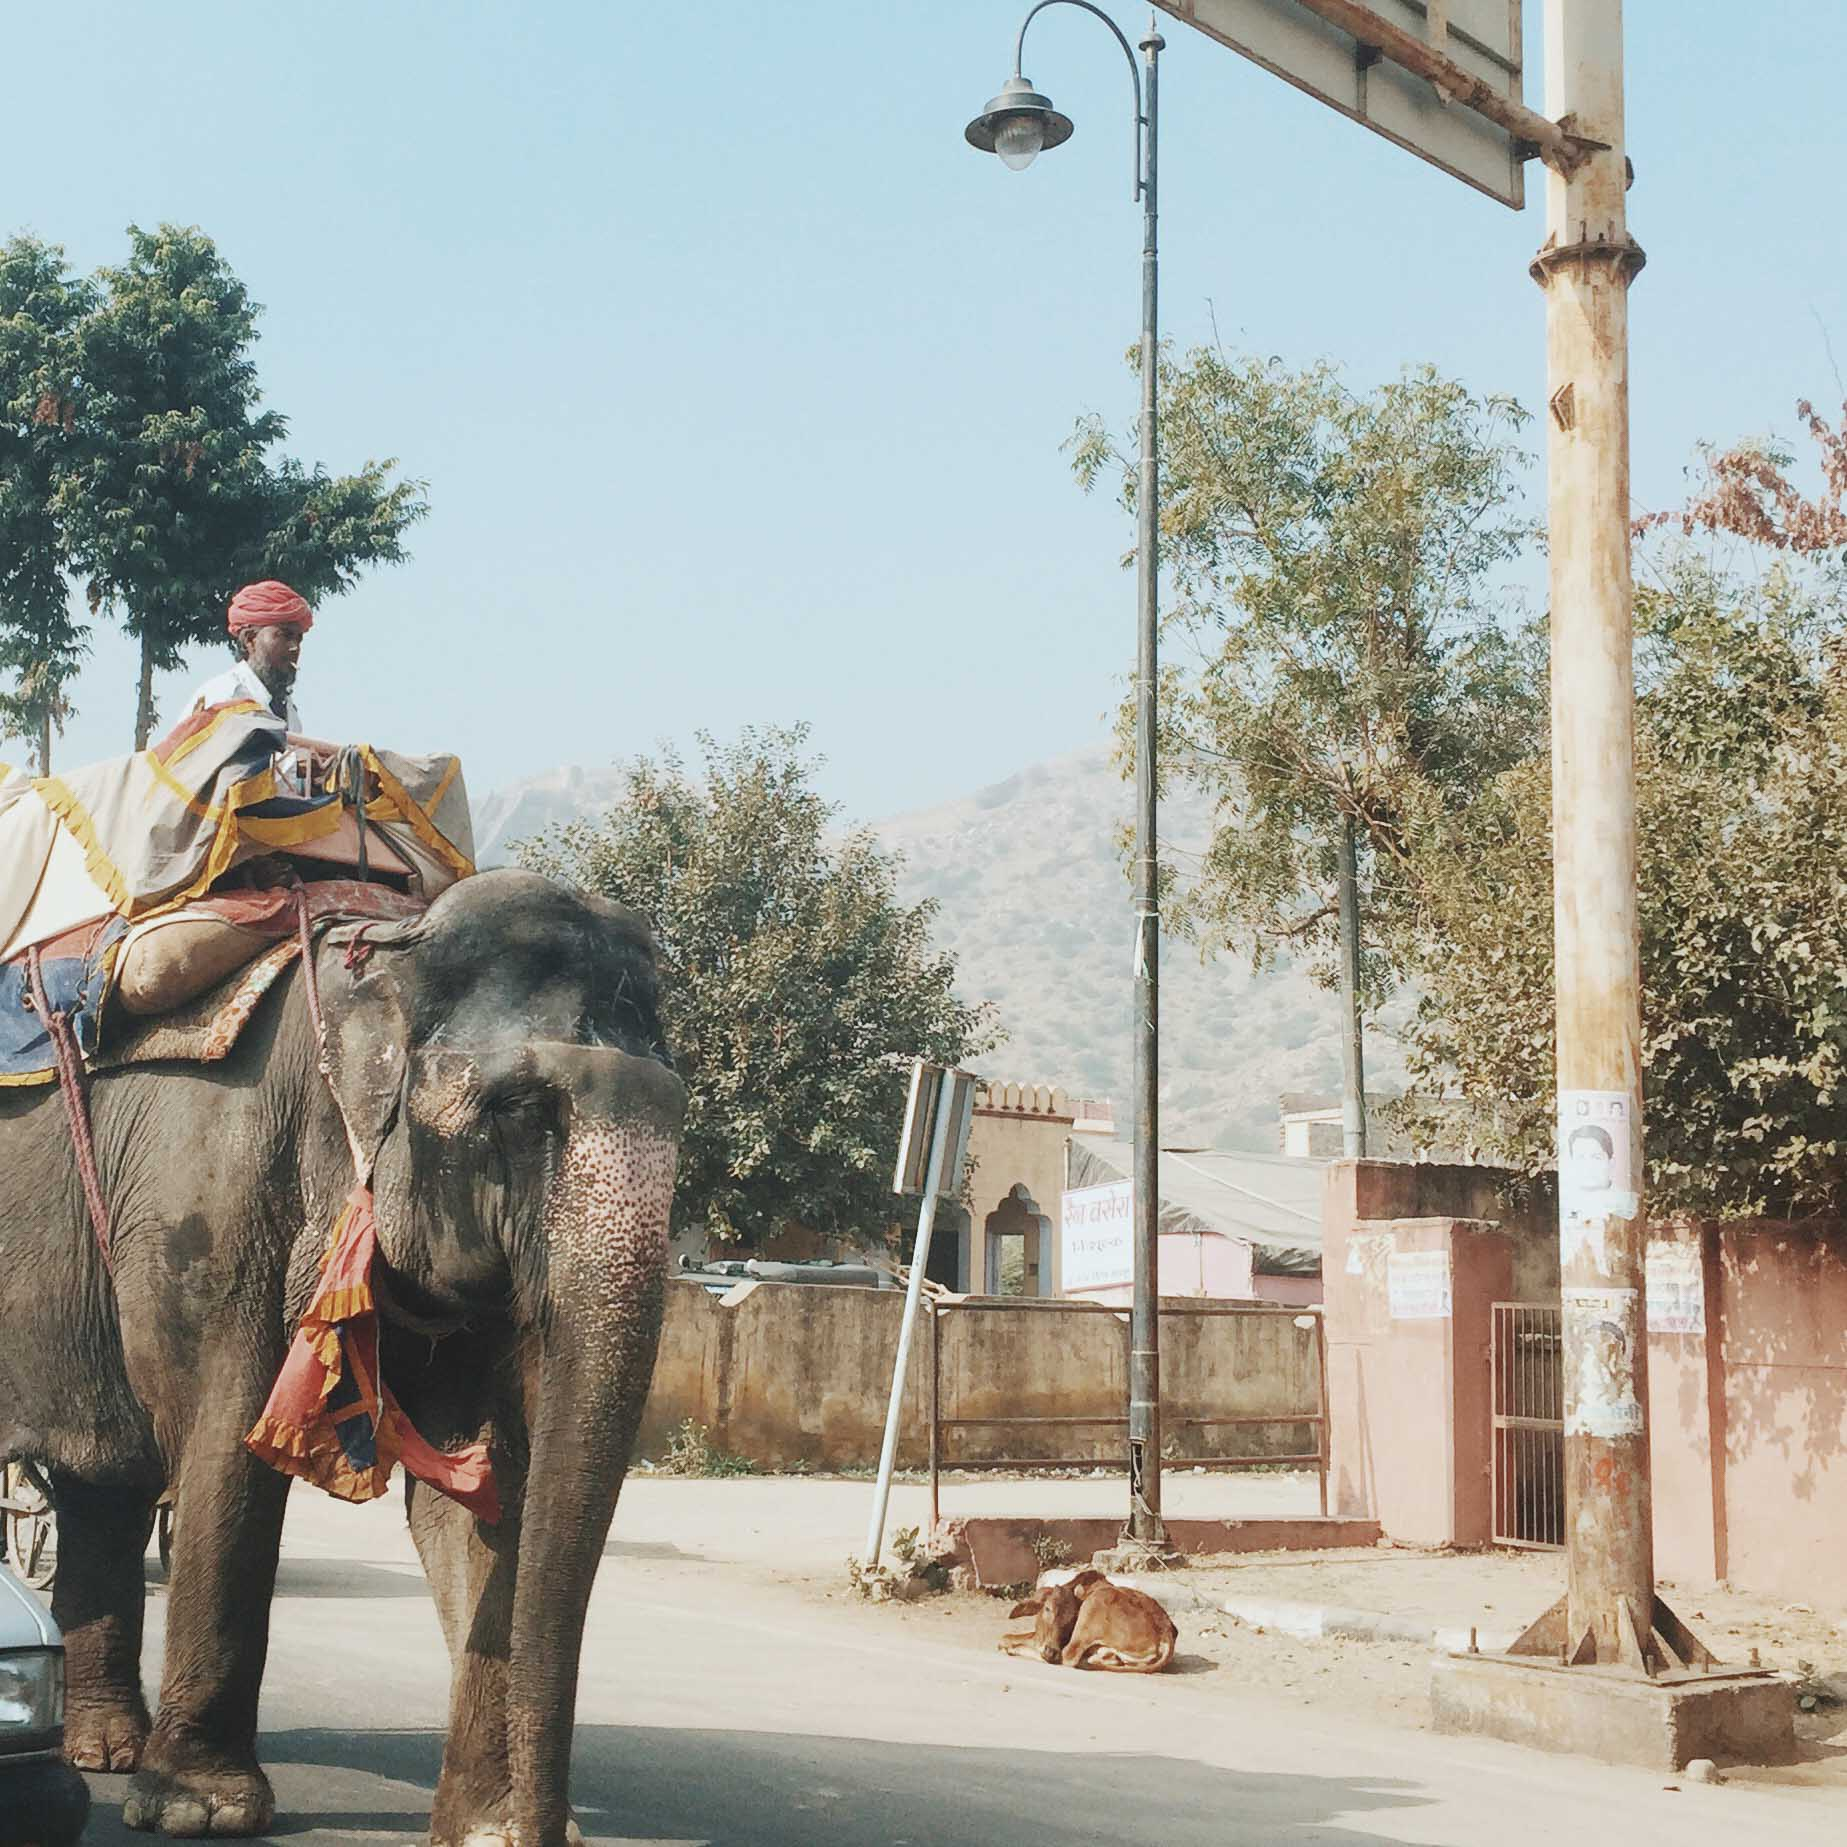 India-4147.jpg